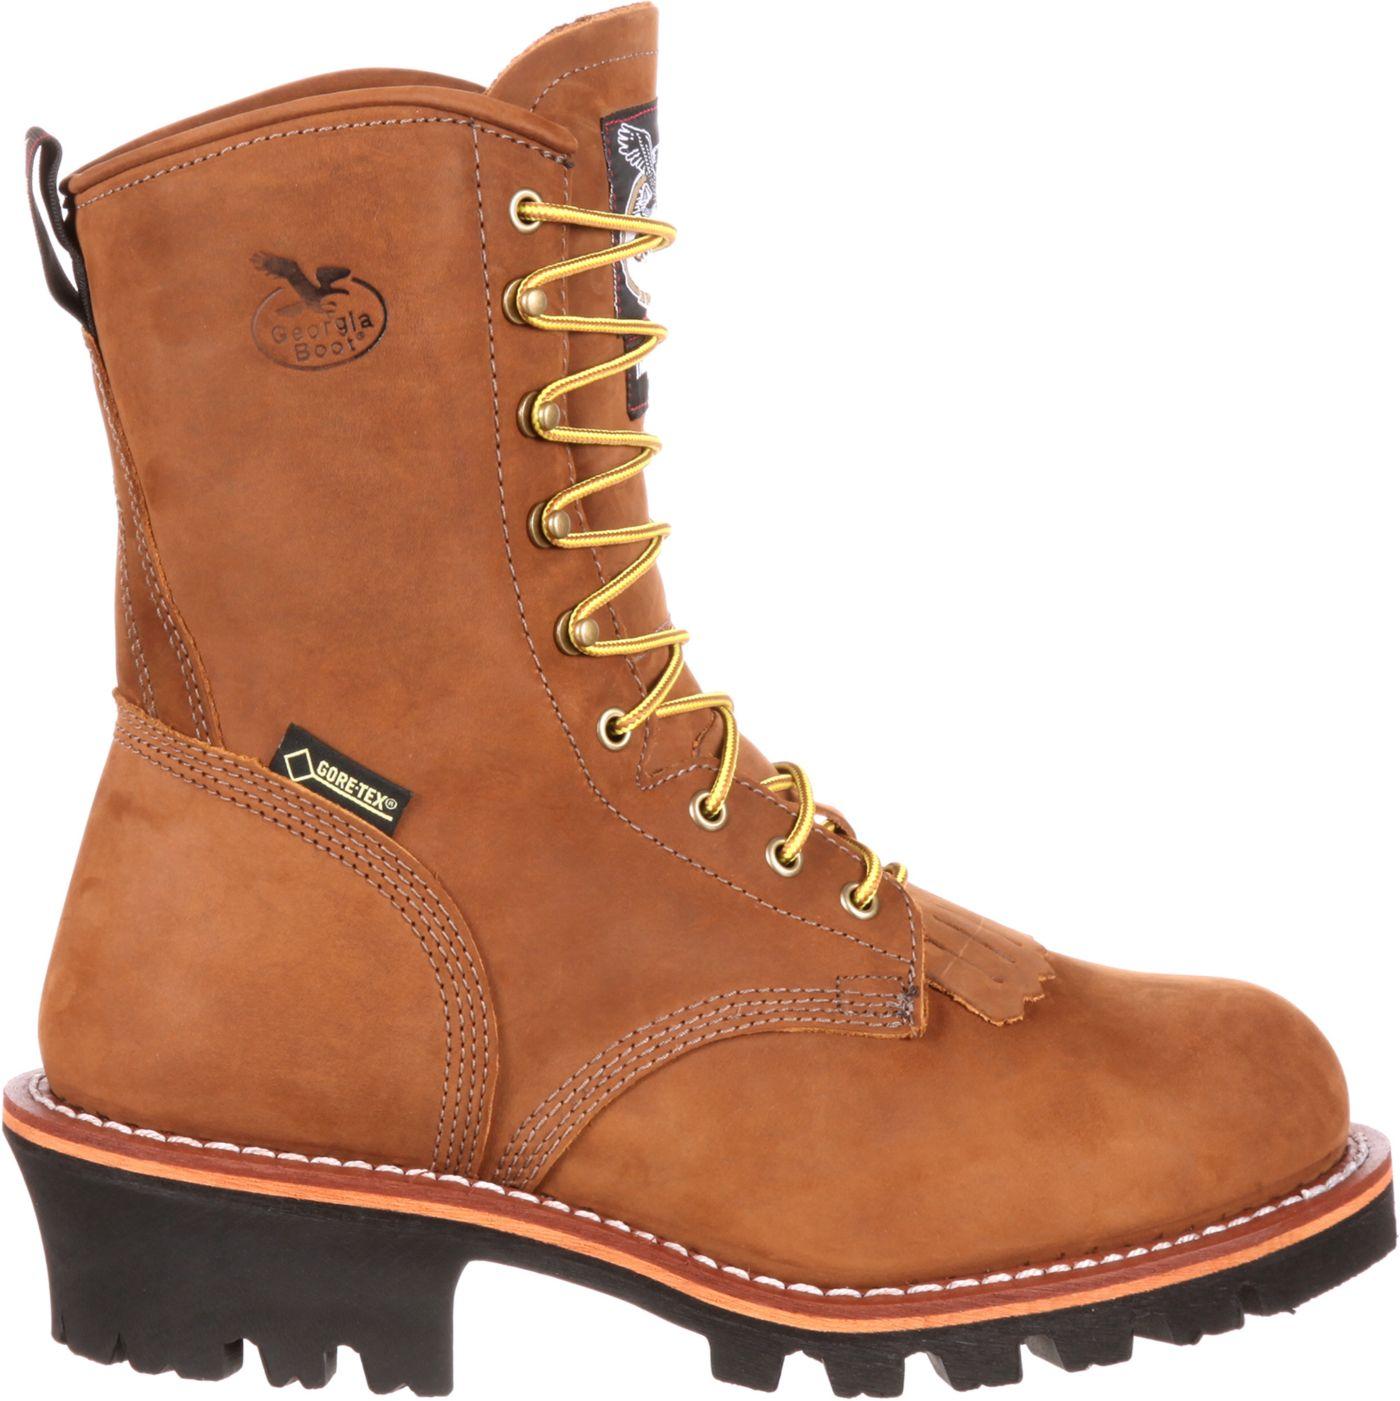 Georgia Boot Men's Logger 400g GORE-TEX Steel Toe Work Boots